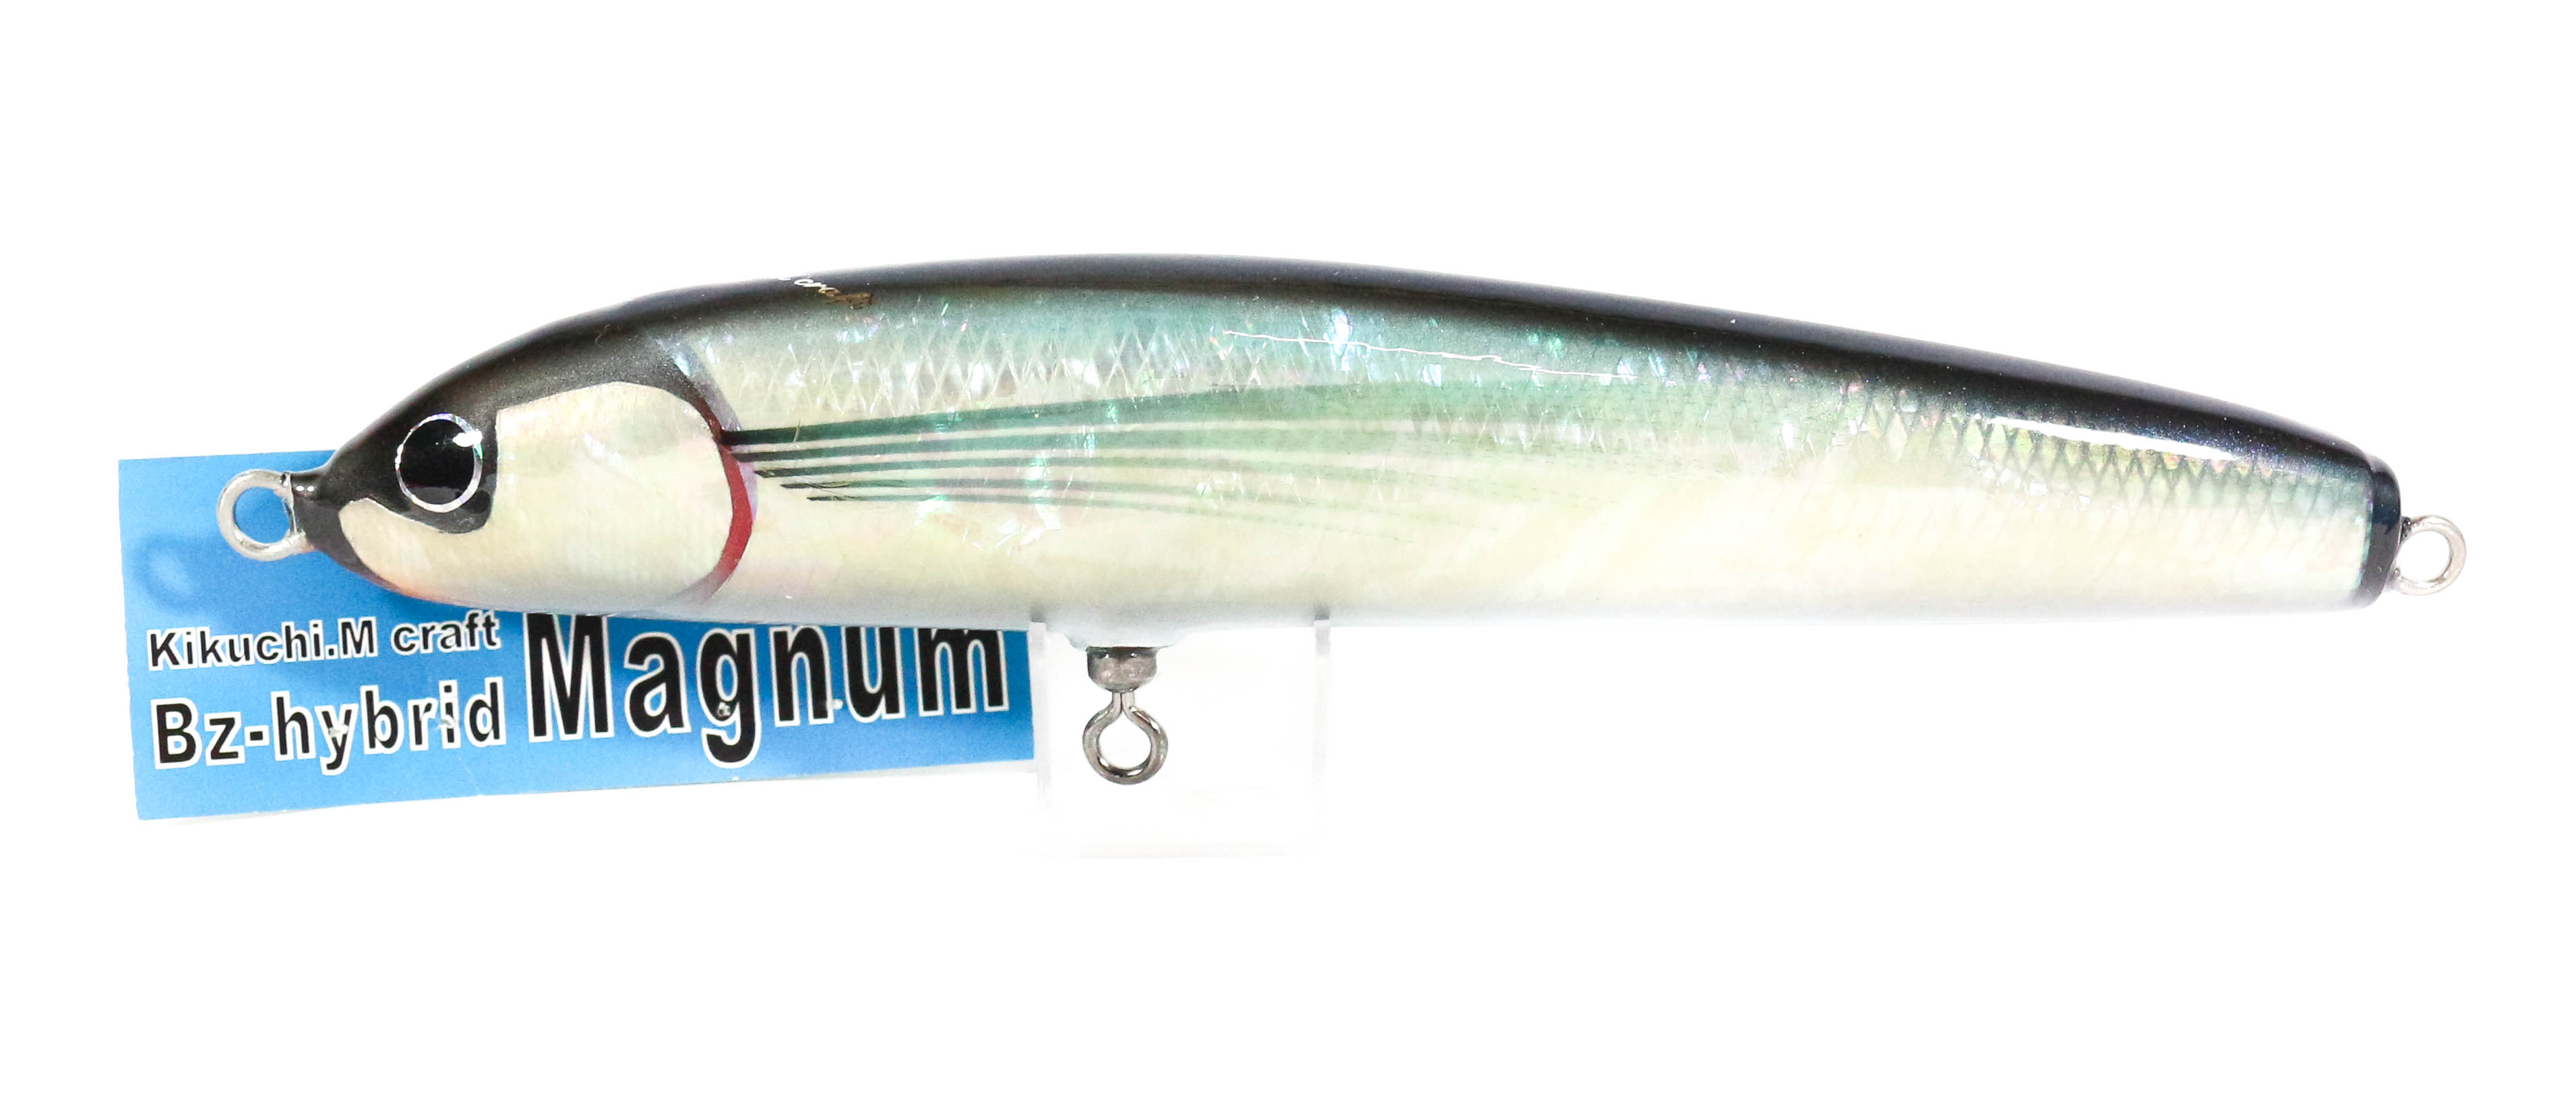 Kikuchi M Craft Bz Hybrid Magnum 240 mm Sinking Lure Shell 170g -185g (0650)